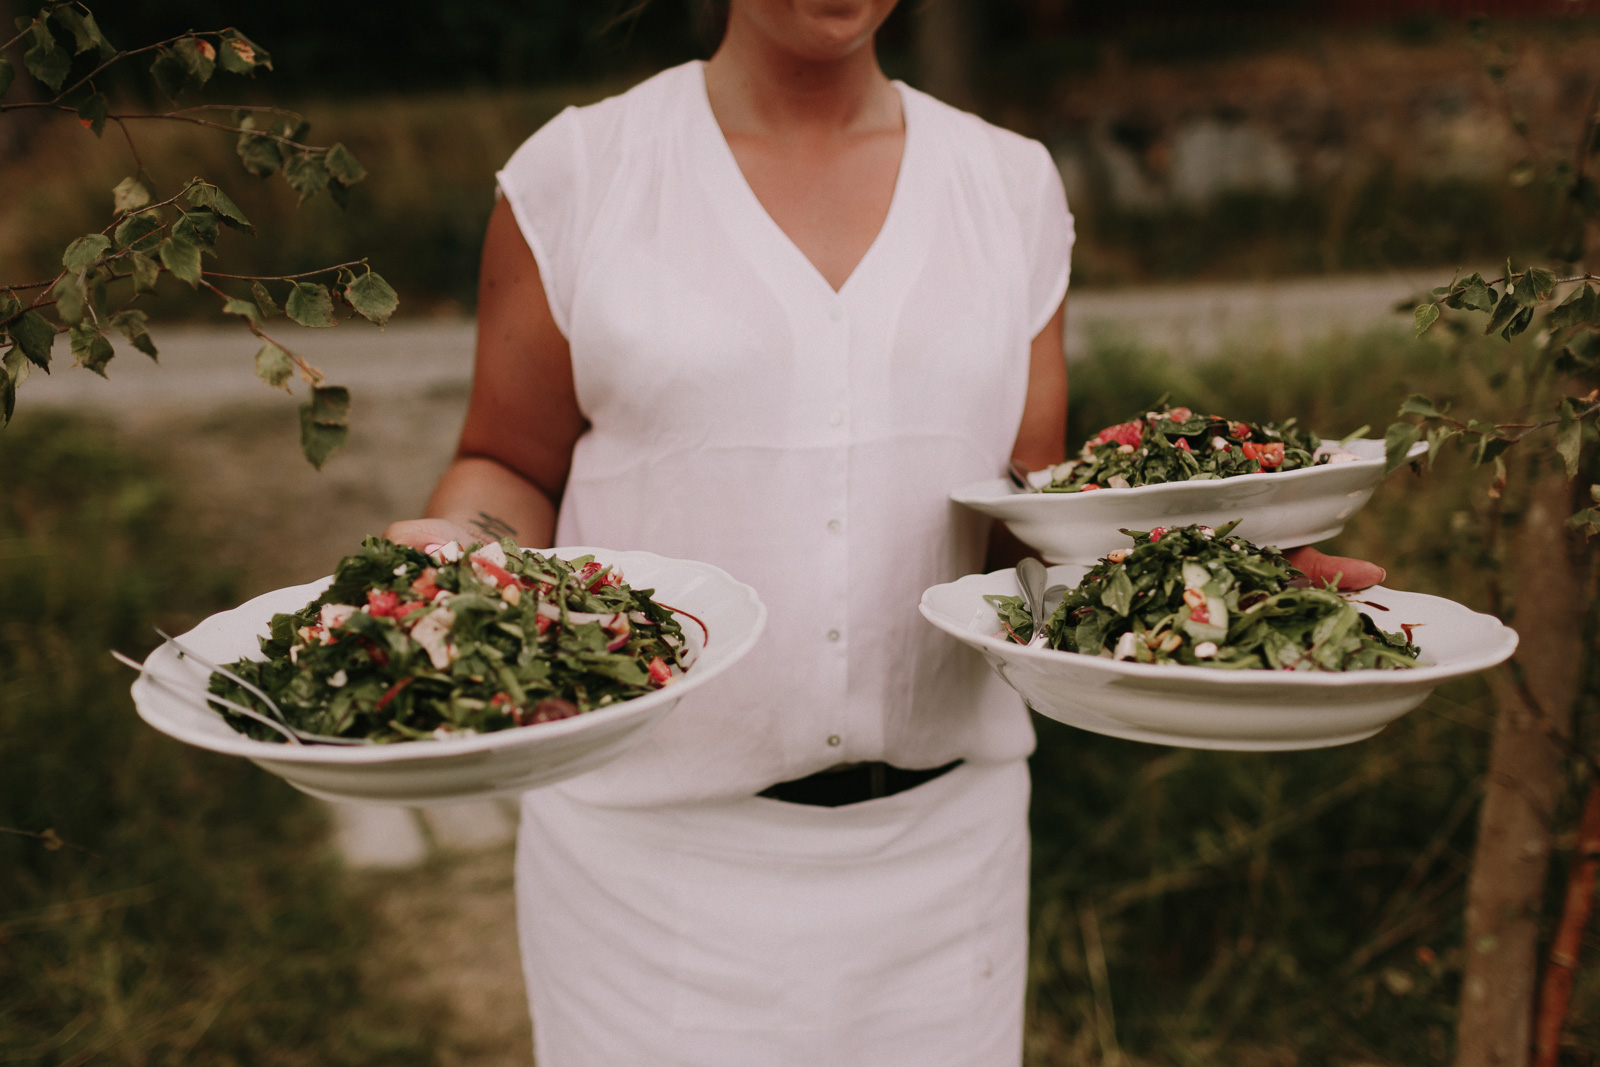 sweden-wedding-food